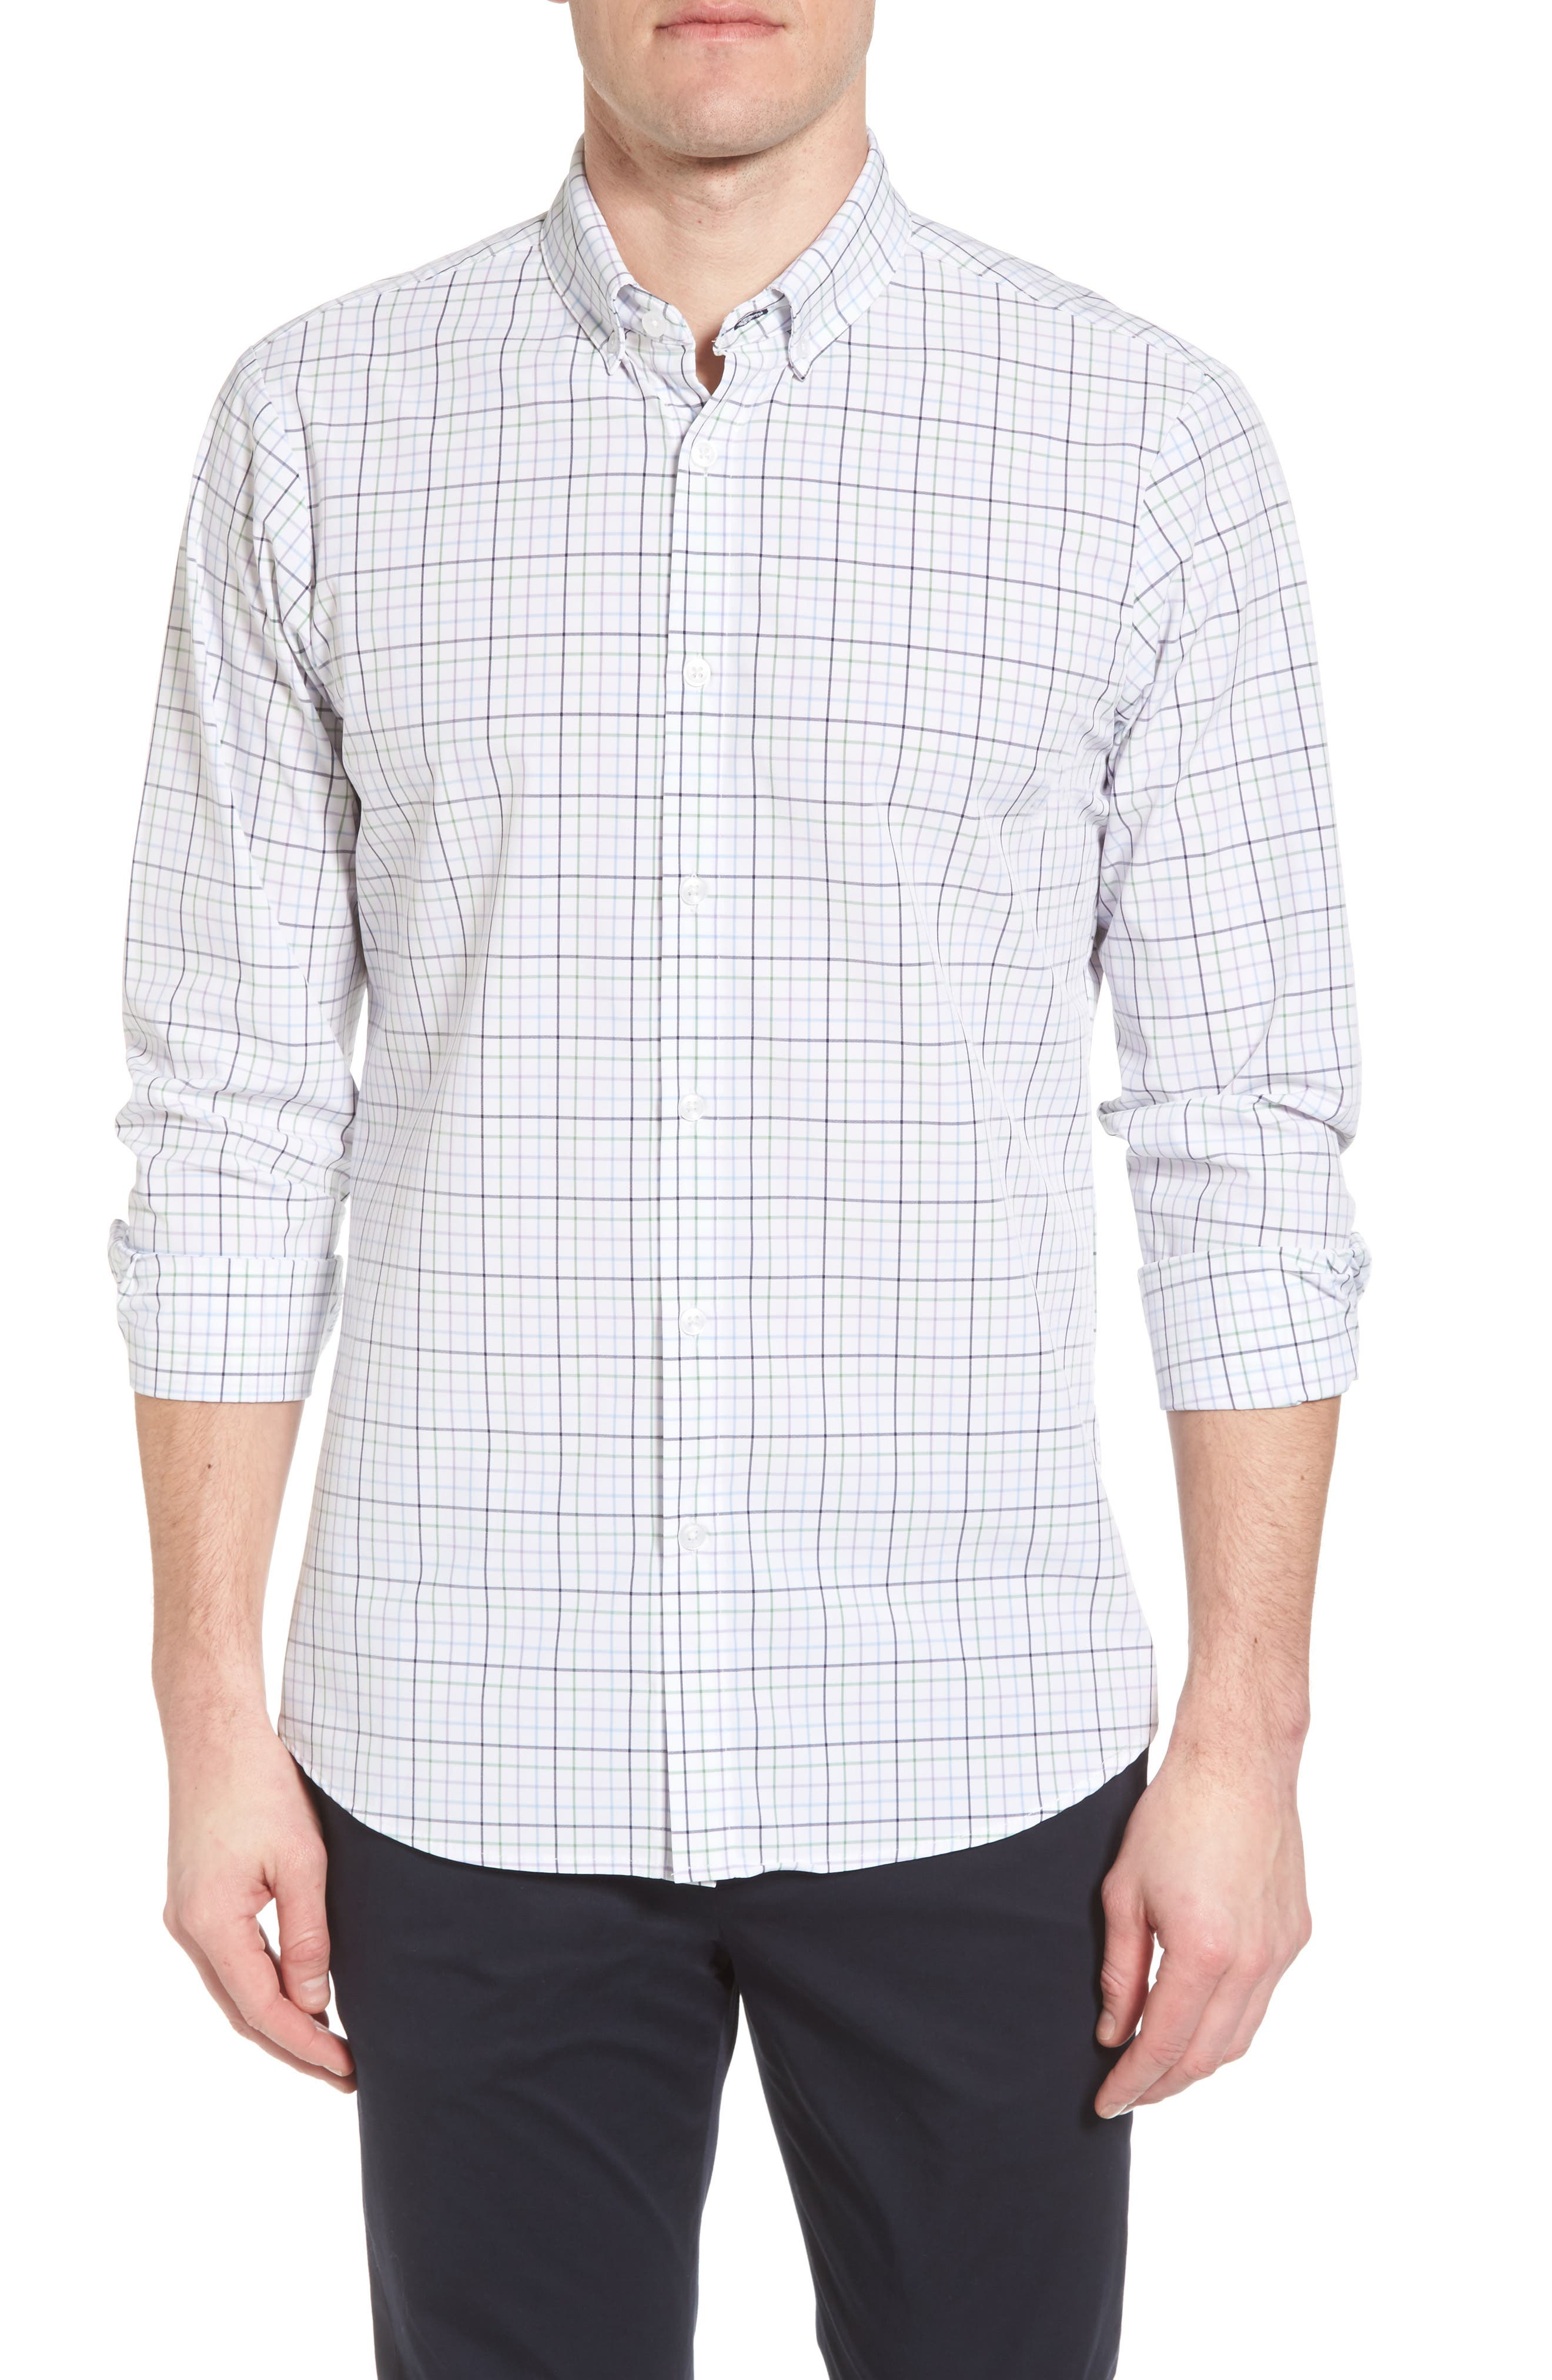 Robertson Check Performance Sport Shirt,                             Main thumbnail 1, color,                             585